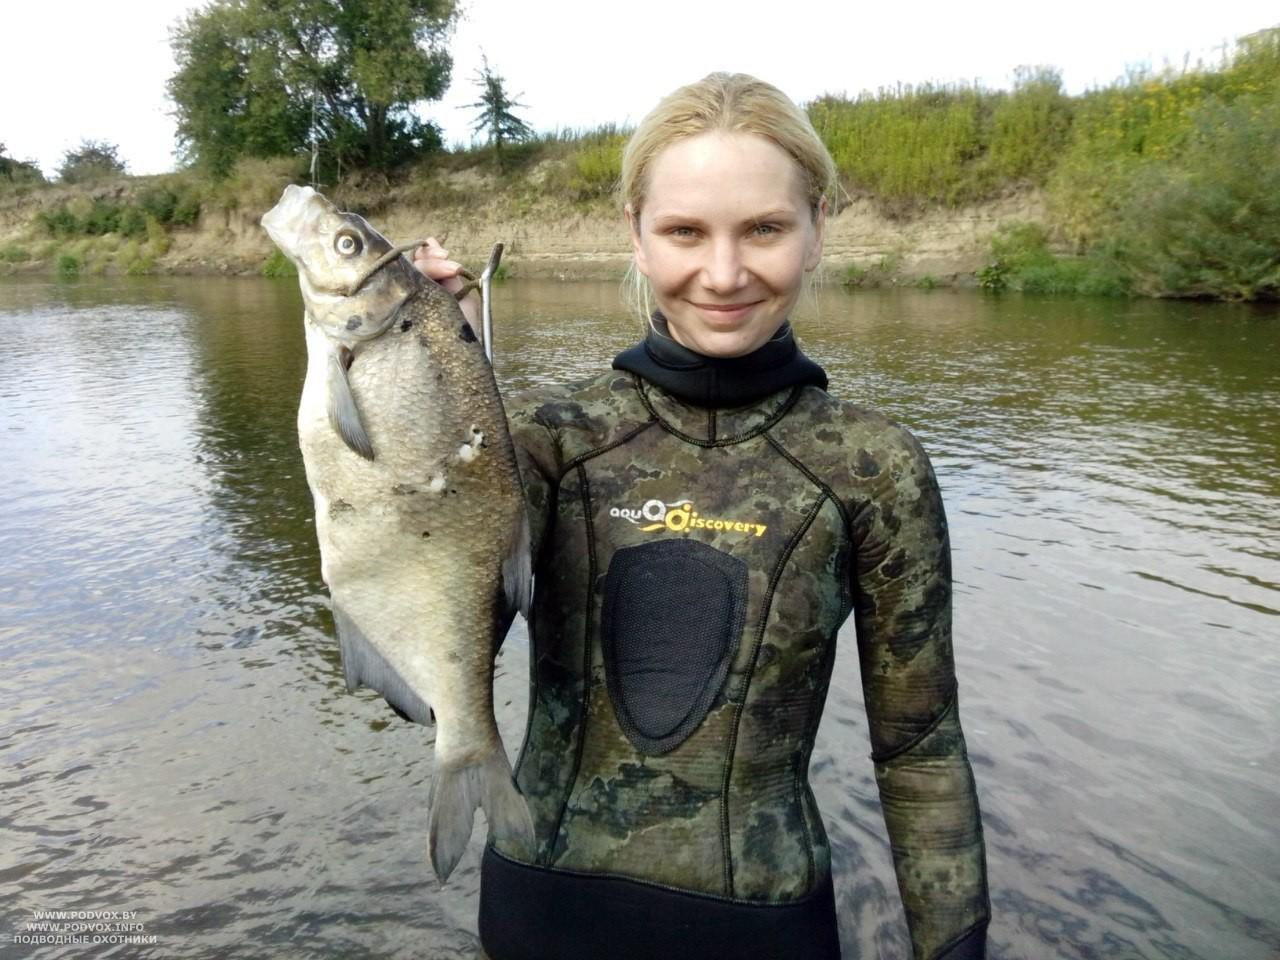 охота и рыбалка сайт пермь